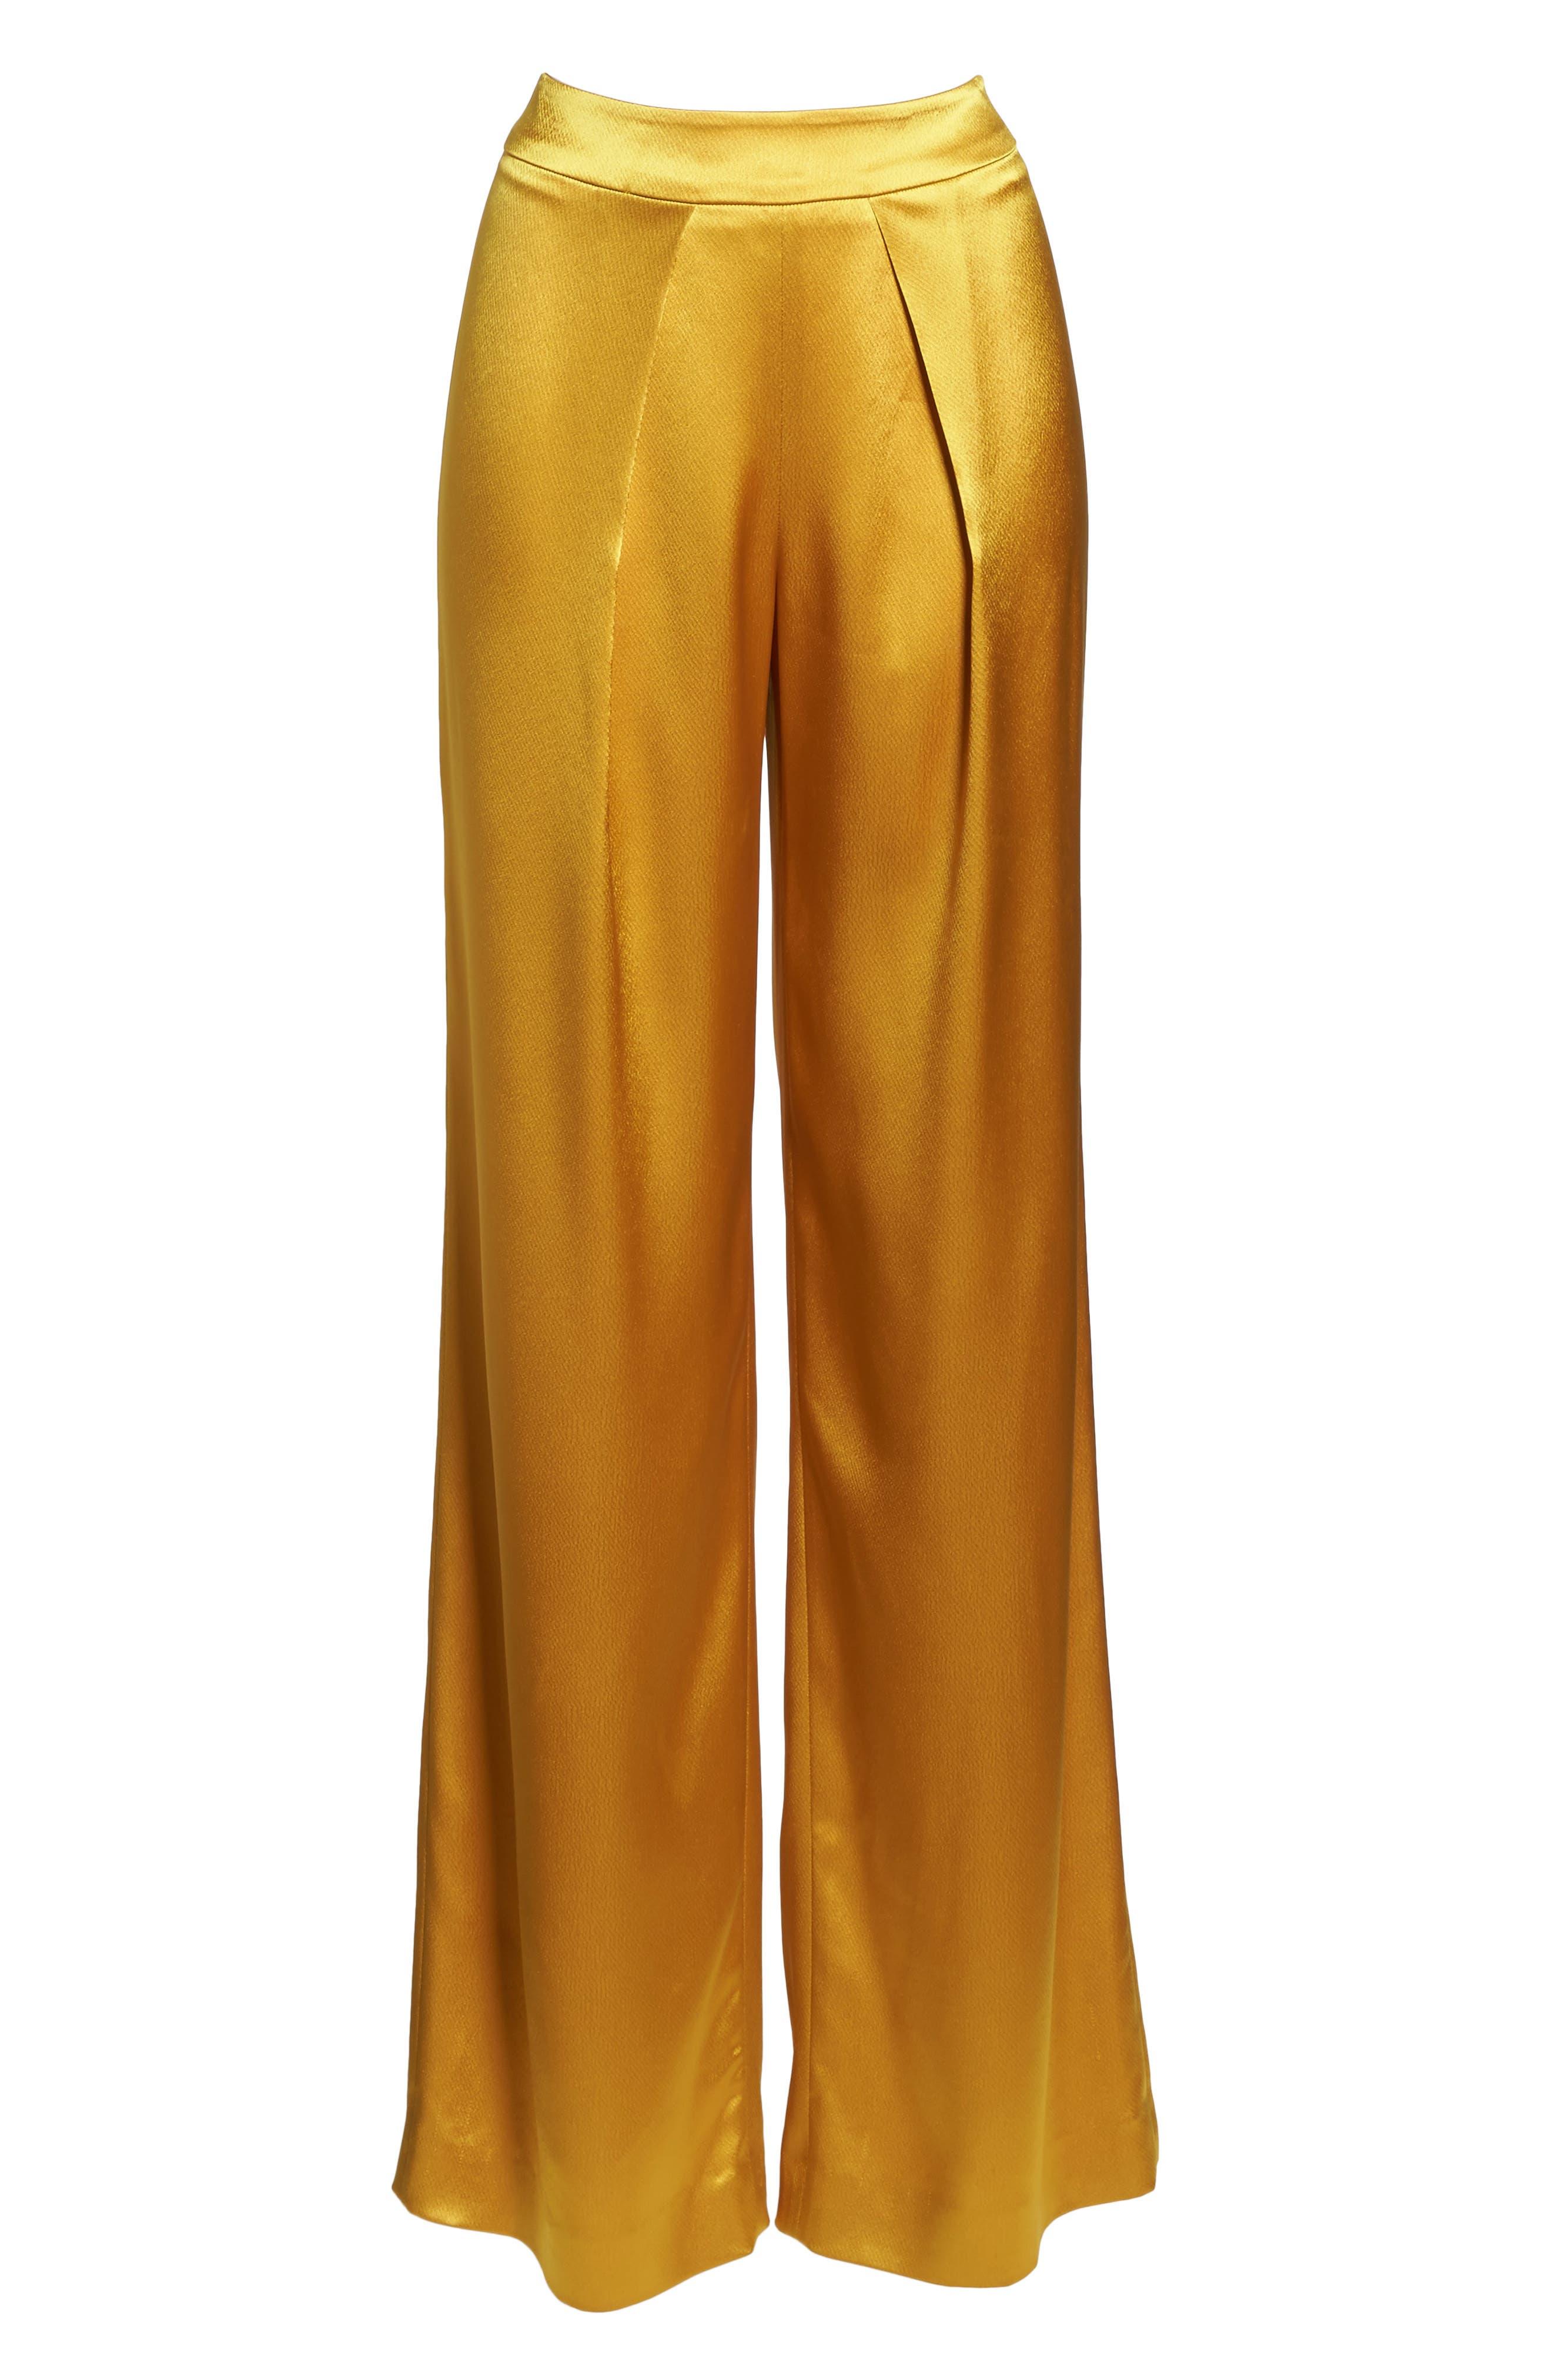 Fancy Pleated Front Satin Pants,                             Alternate thumbnail 6, color,                             700